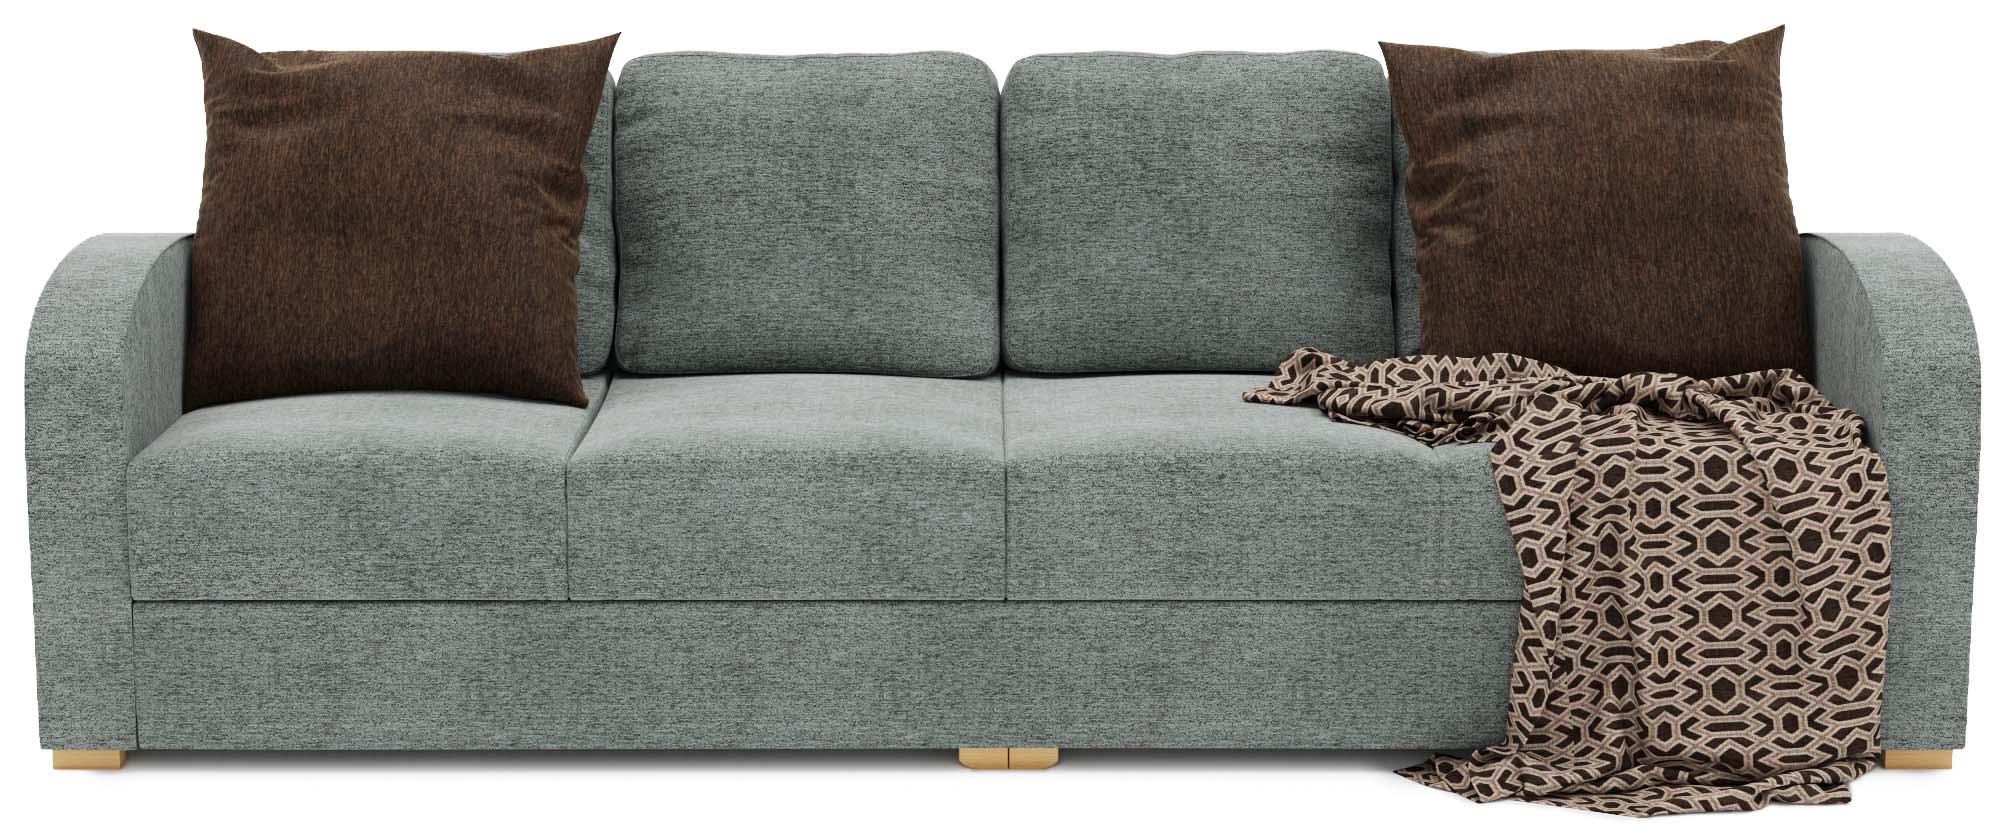 Orb 4 Seat Sofa